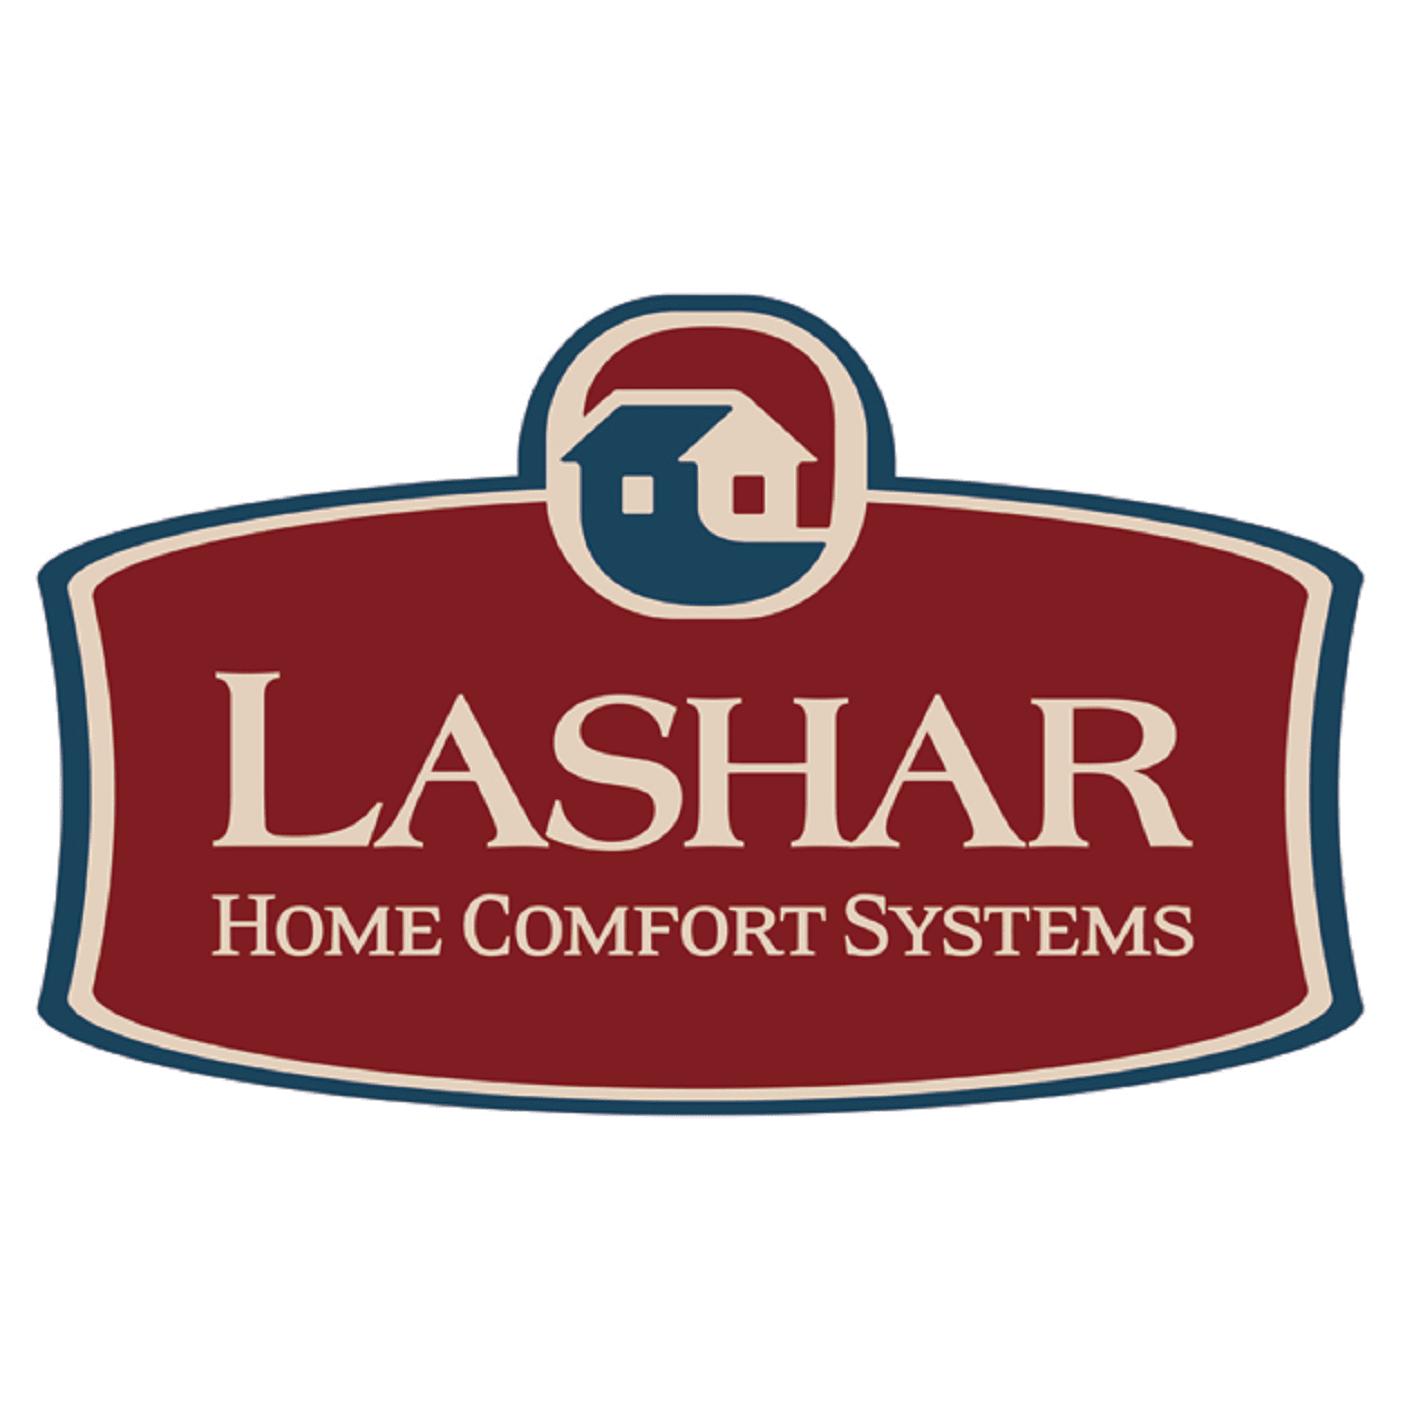 Lashar Home Comfort Systems